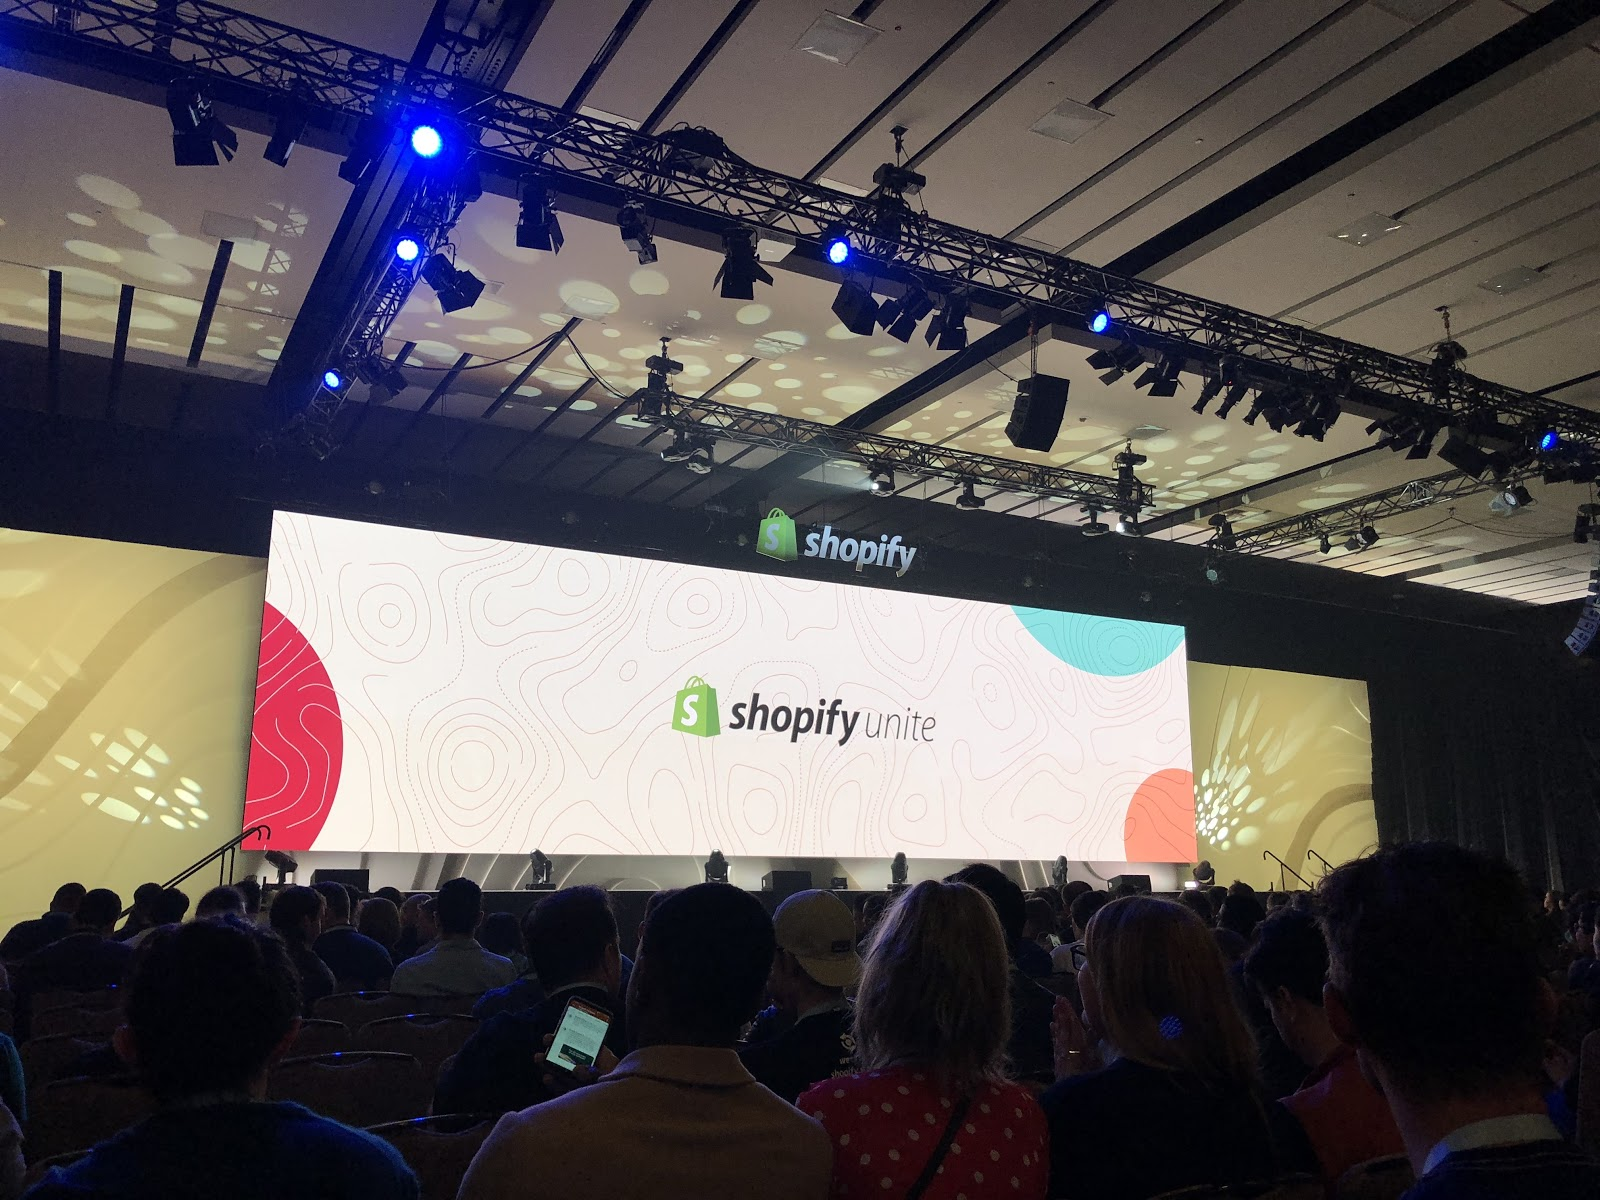 Shopify Unite 2019